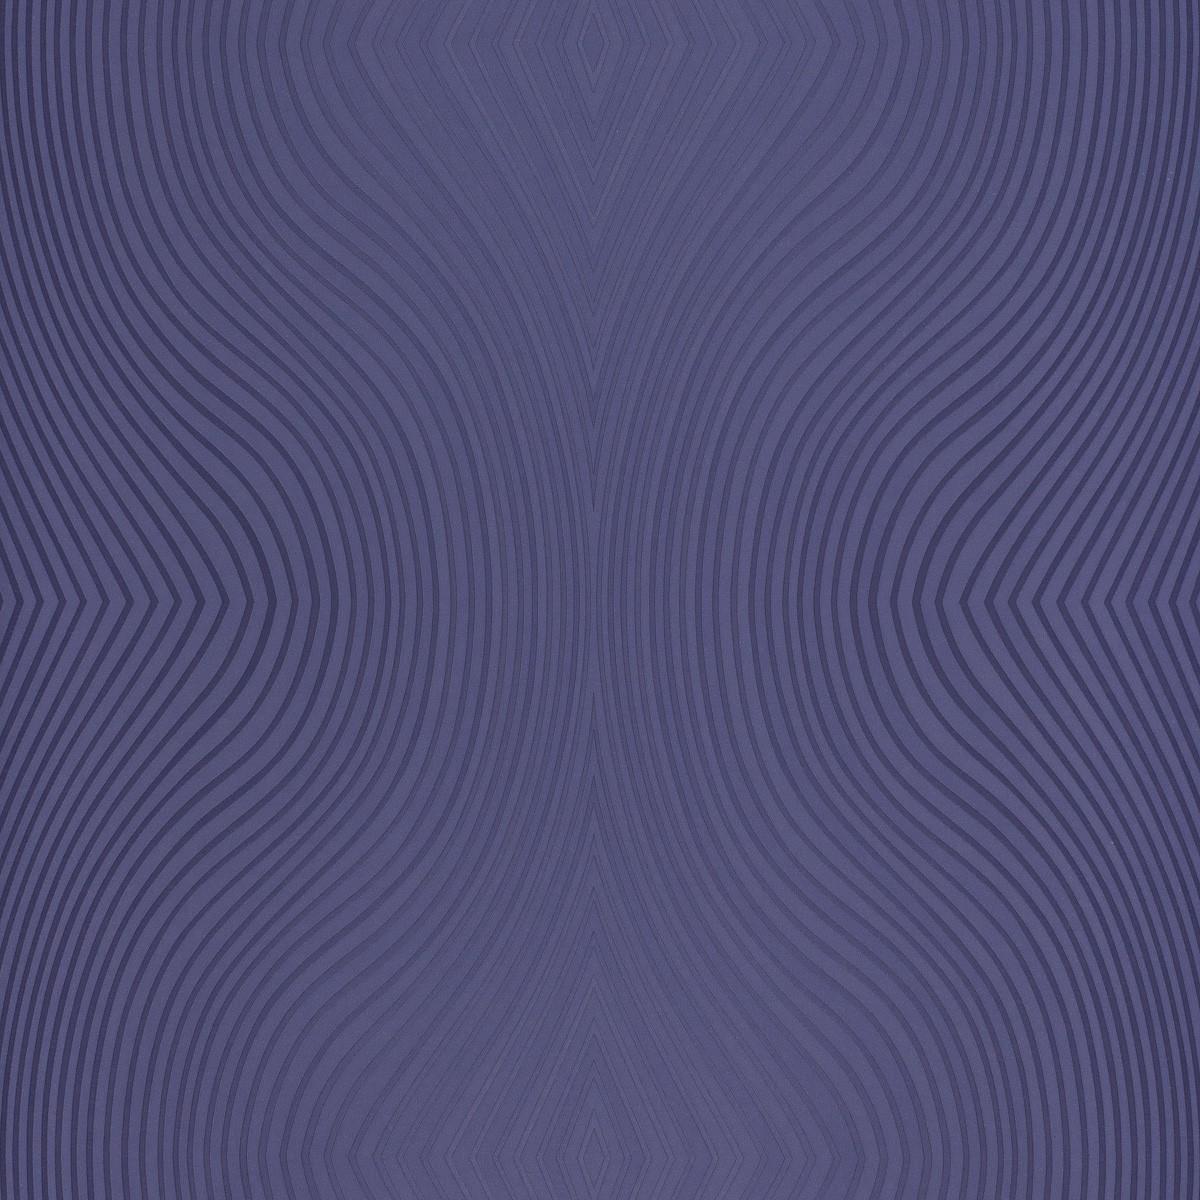 harald gl ckler tapeten blau retro designe pomp s 52517 designer tapete 4 57 ebay. Black Bedroom Furniture Sets. Home Design Ideas